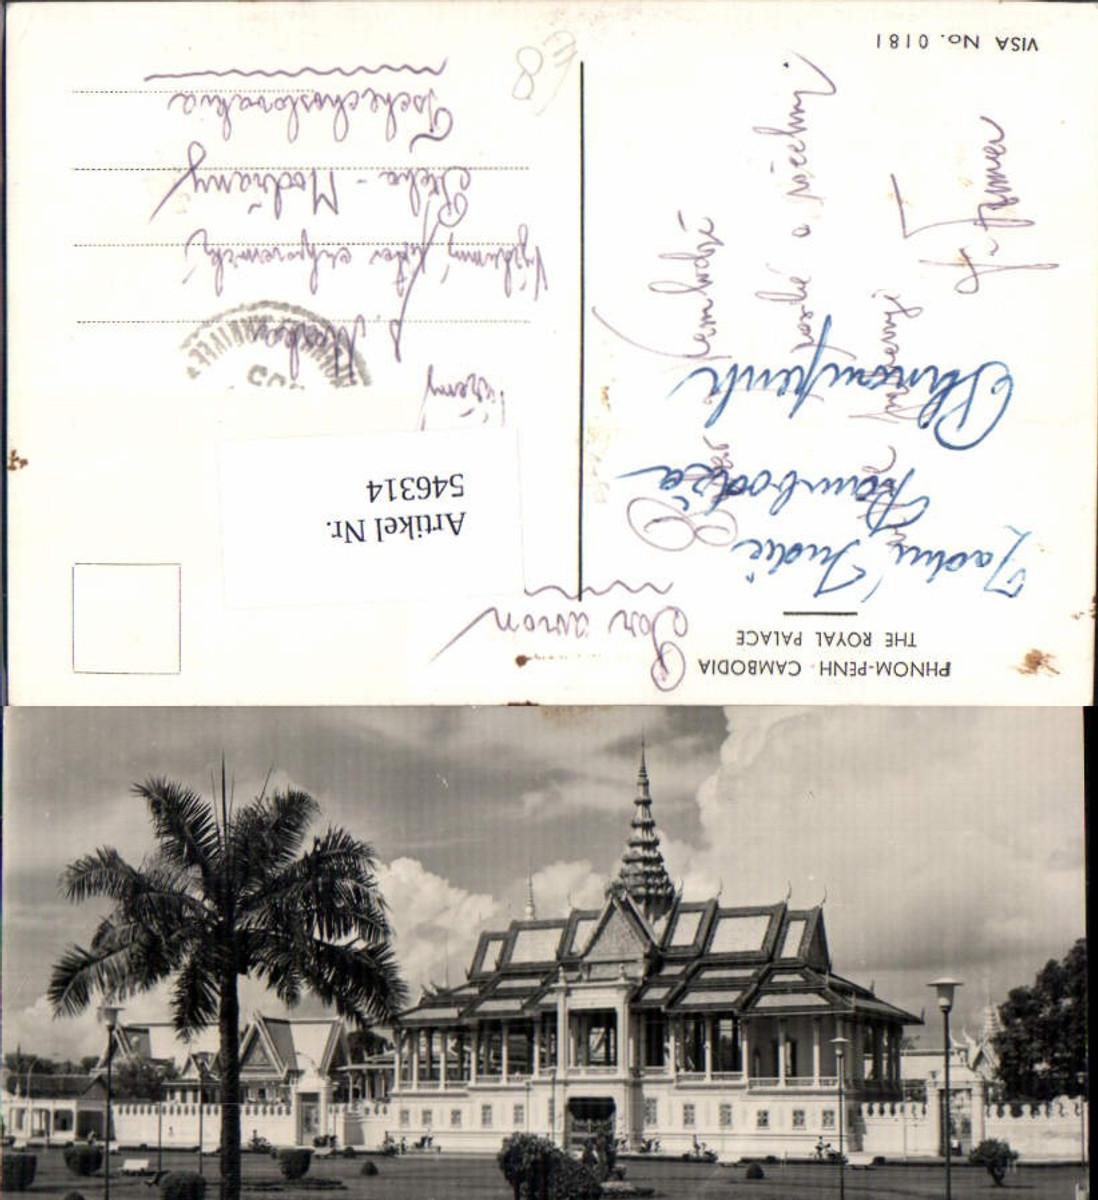 546314,Cambodia Phnom Penh The Royal Place günstig online kaufen